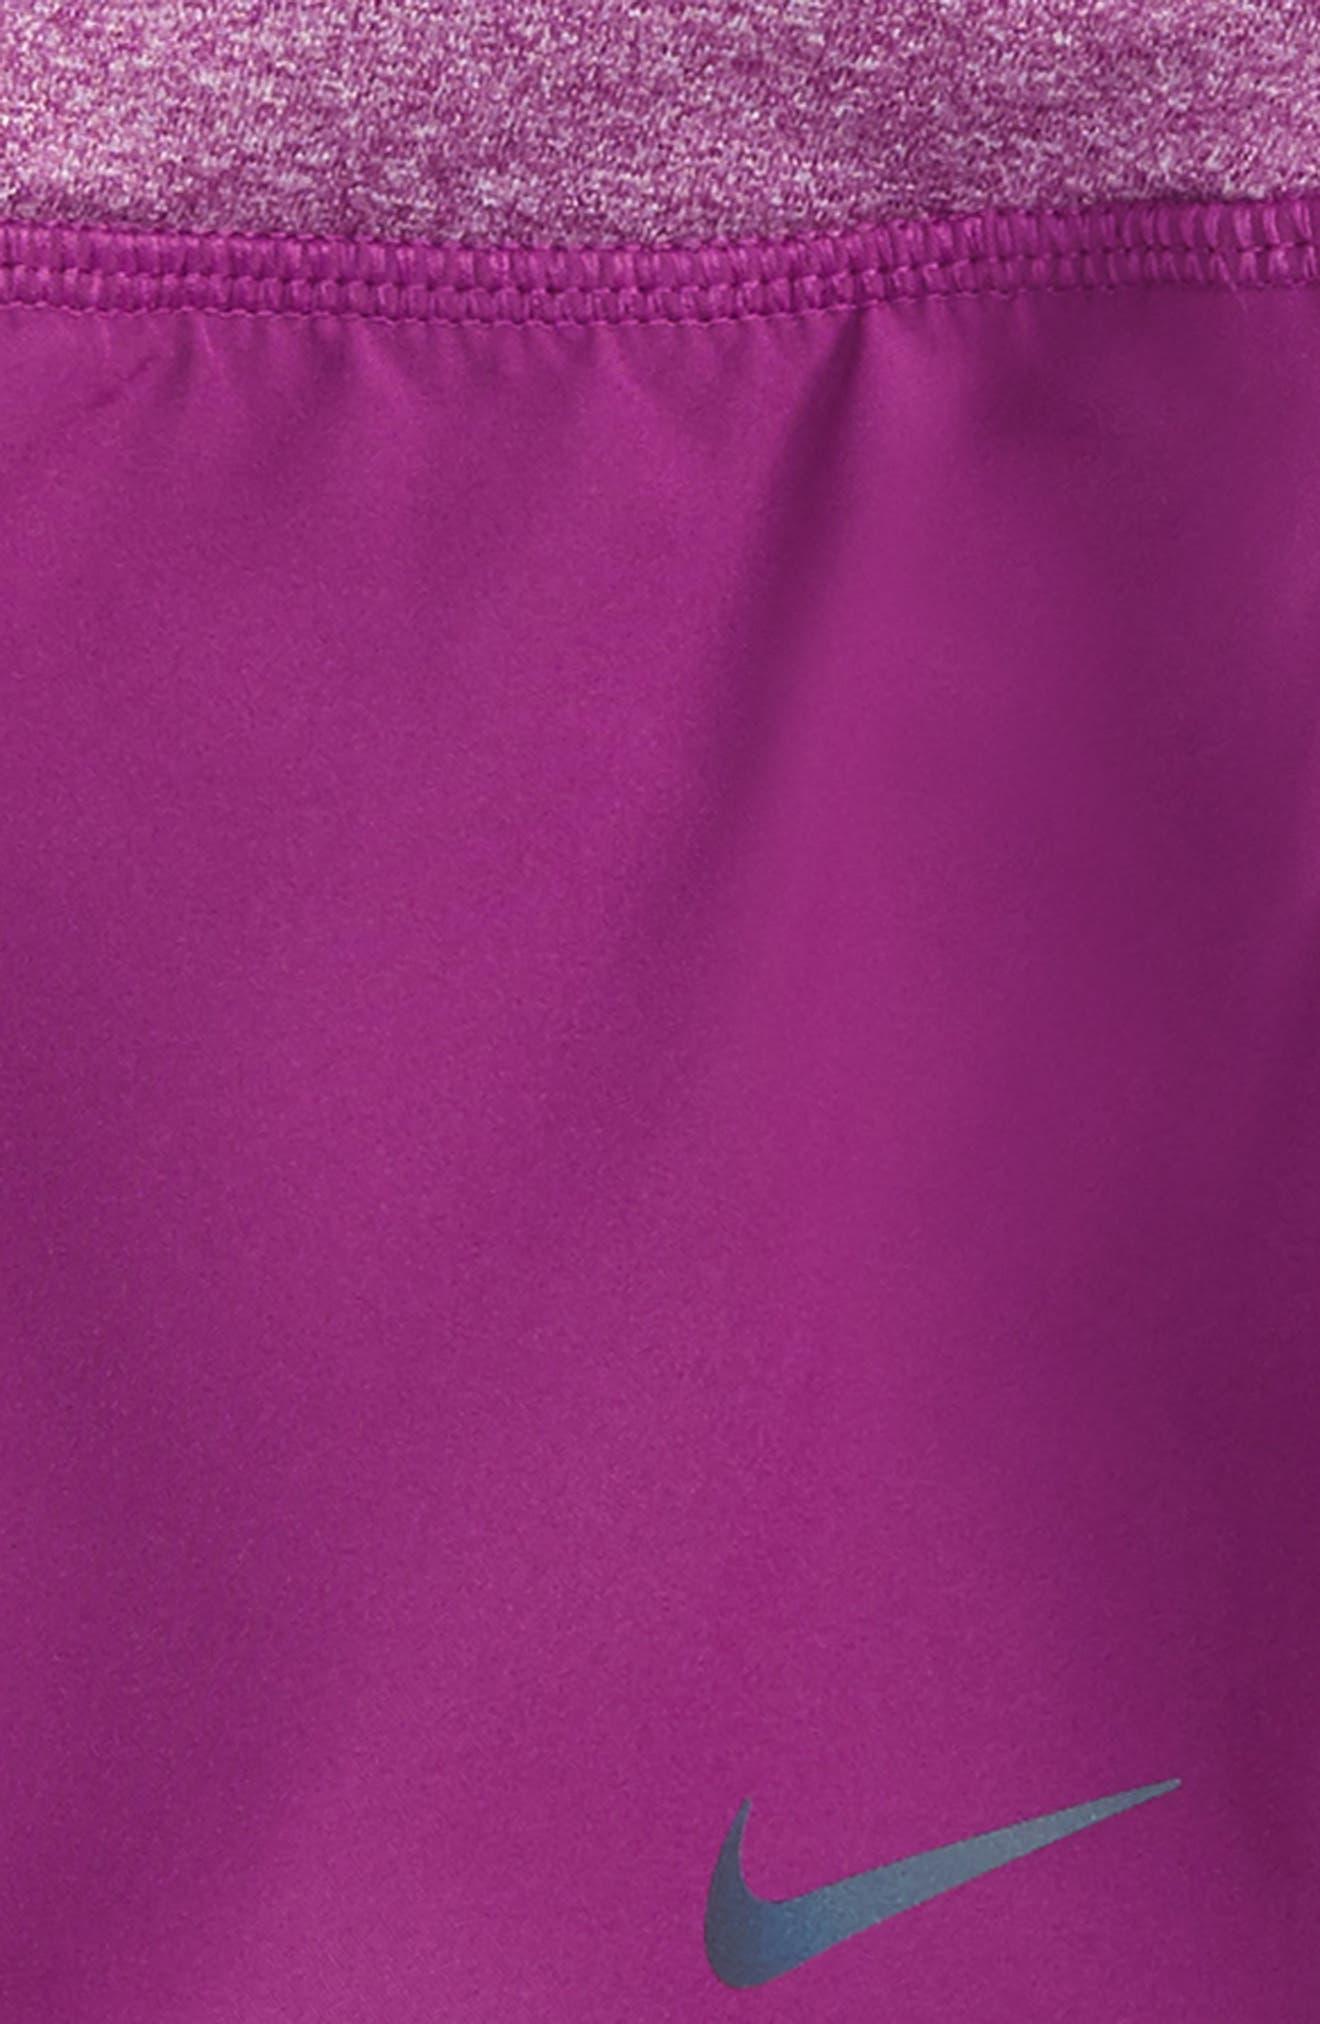 Alternate Image 2  - Nike 'Rival' Dri-FIT Shorts (Big Girls)